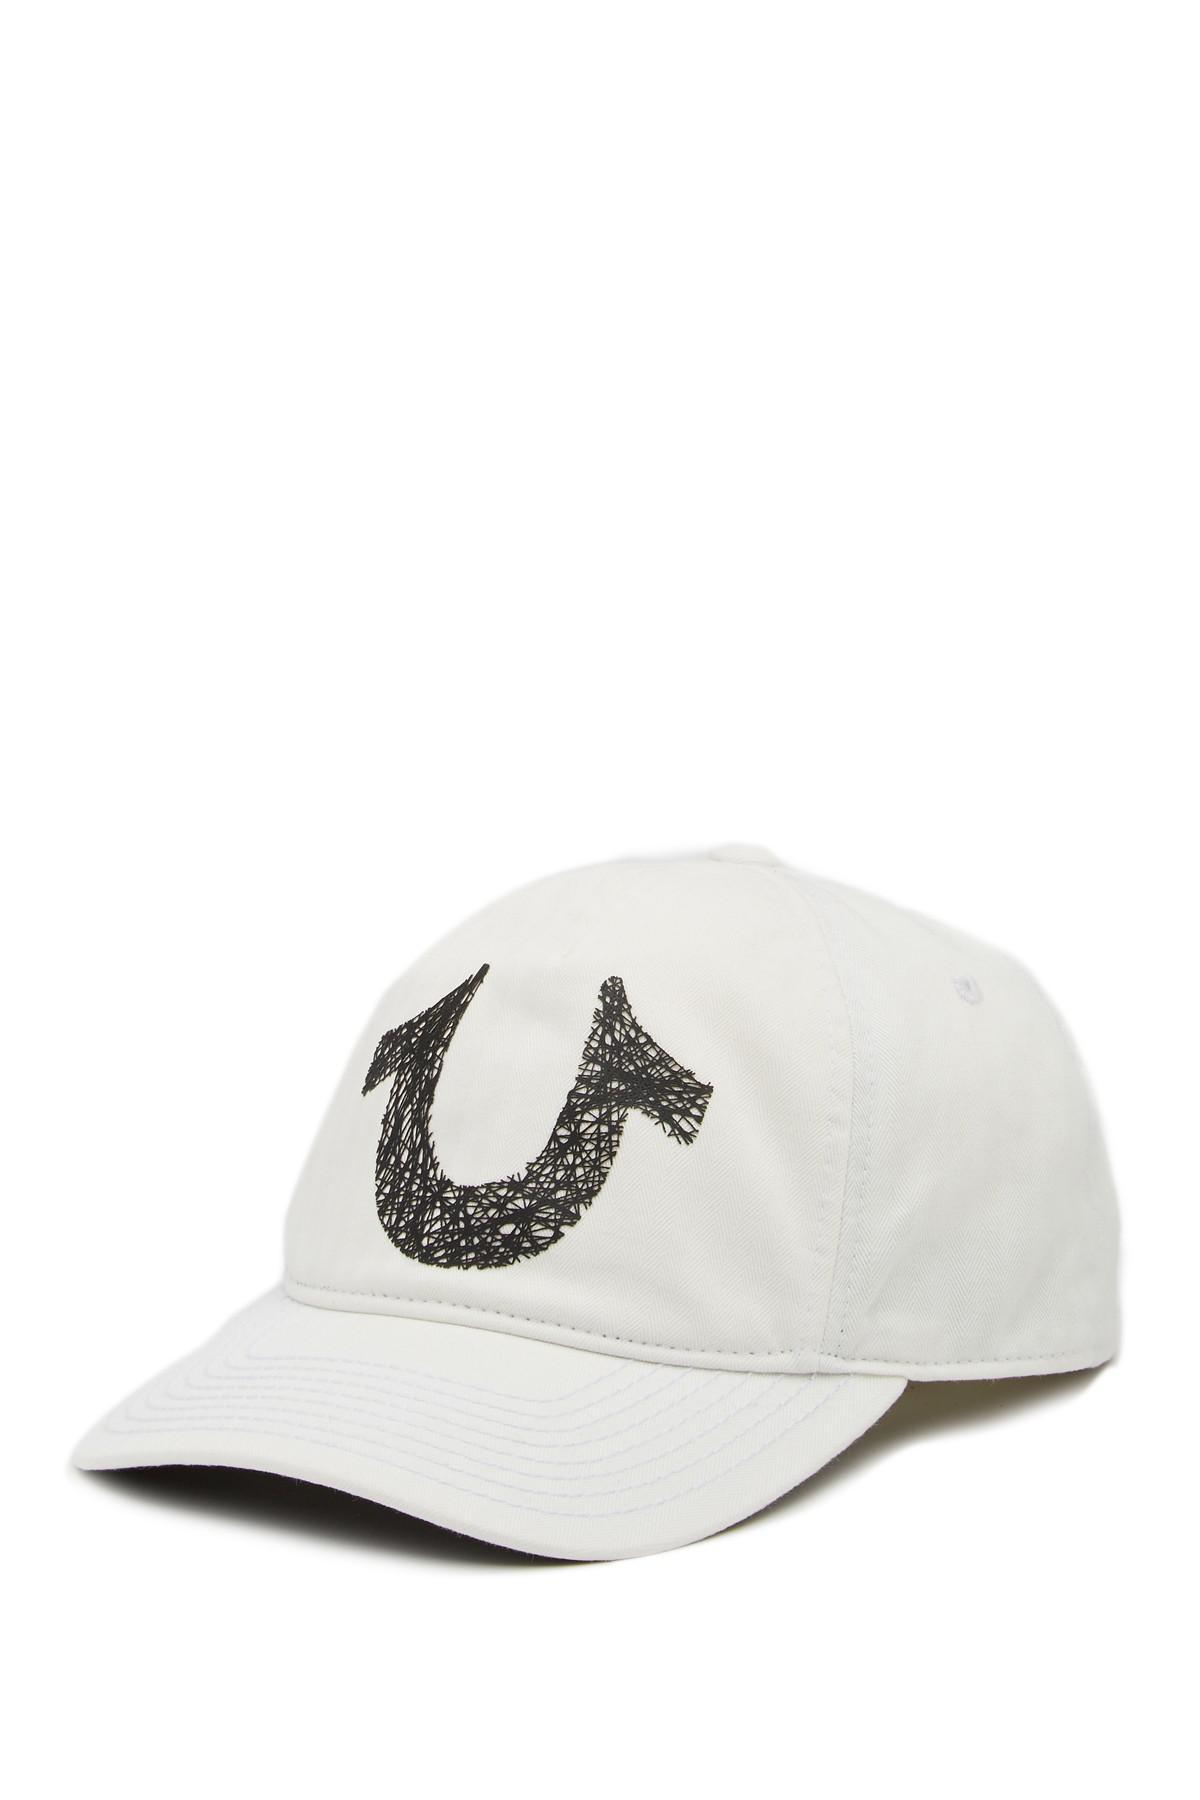 Cap With Logo In White - White Religion I1kTTYvr